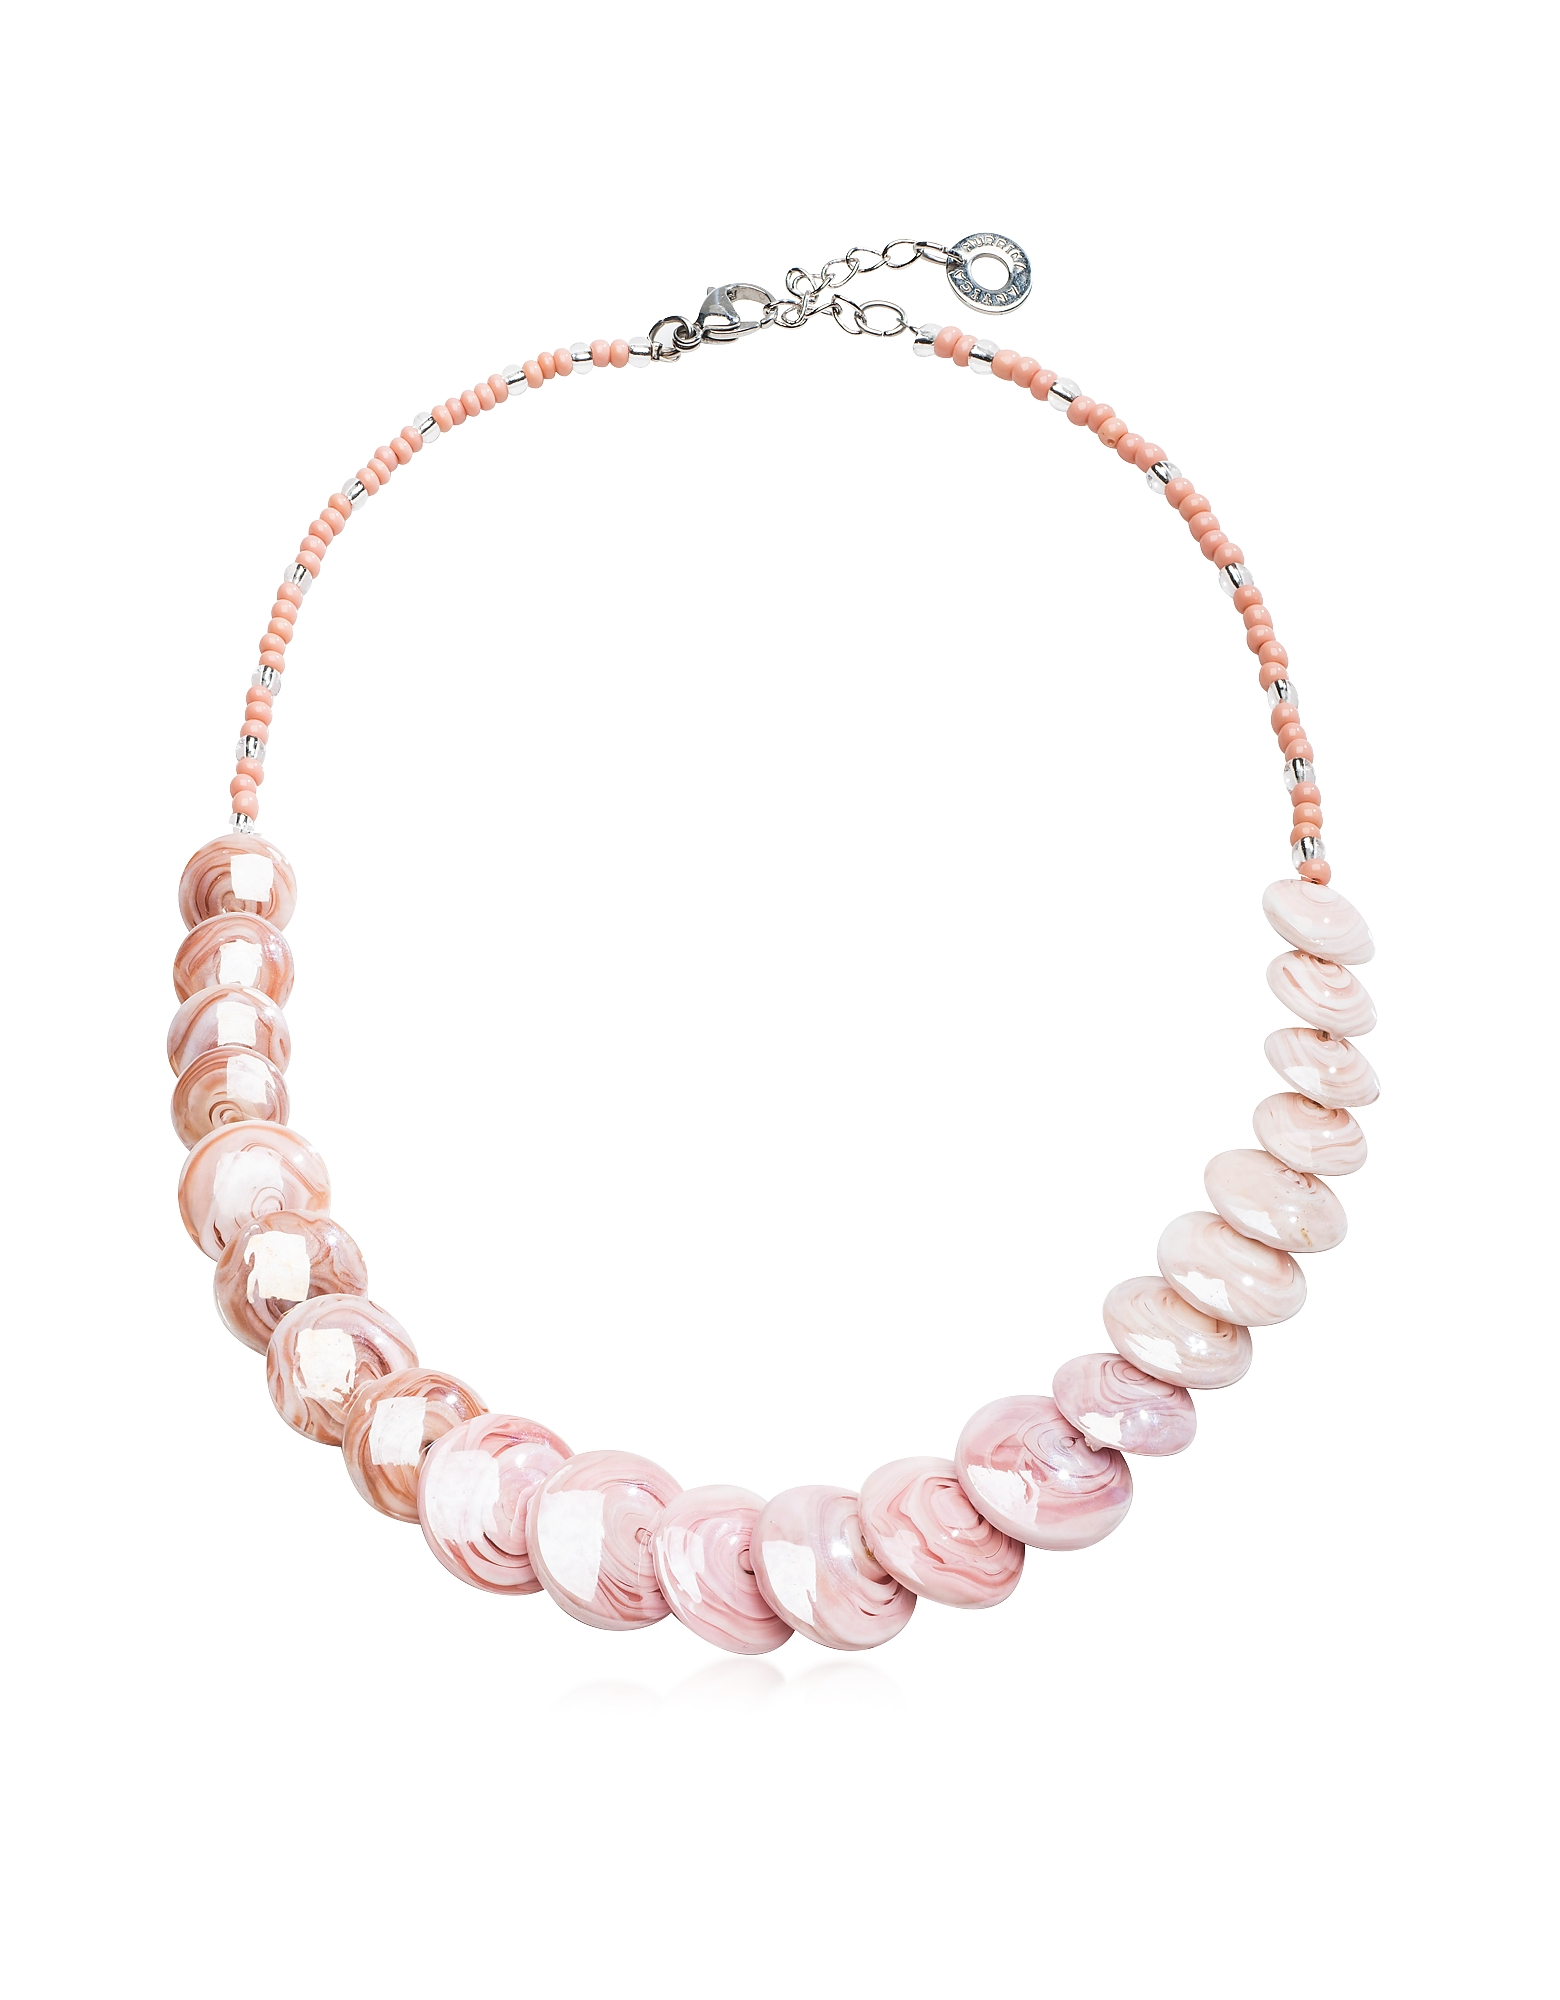 Antica Murrina Necklaces, Monete 2 Pastel & Transparent Light Pink Murano Glass Choker